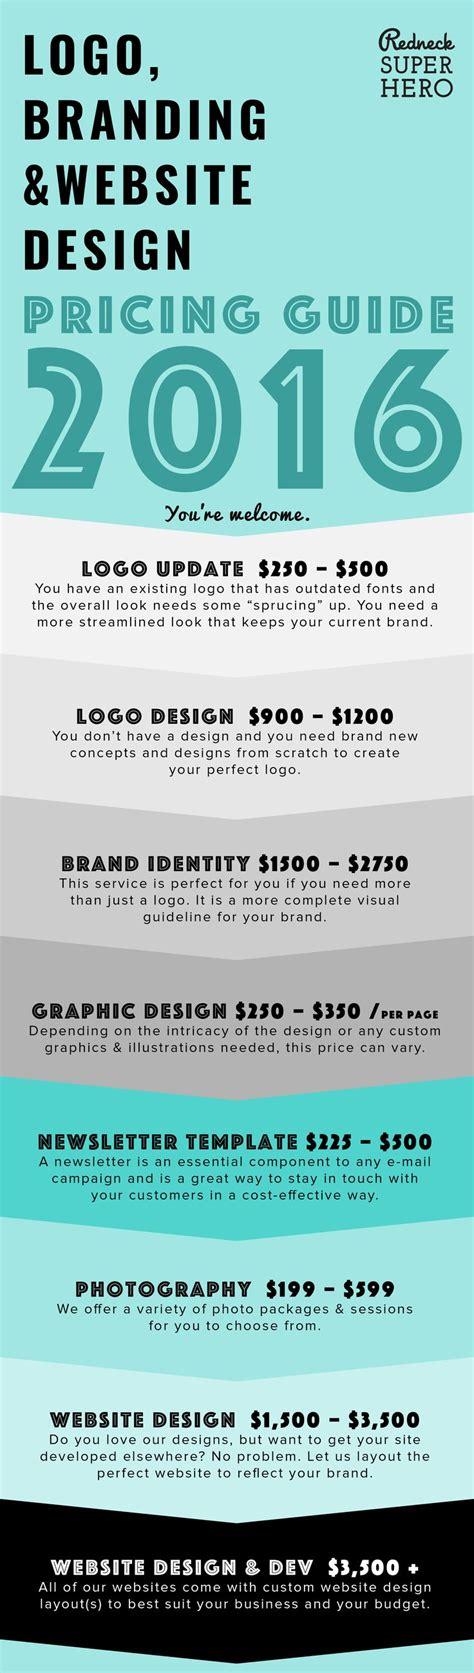 25 best freelance resources images on pinterest freelance graphic design bidding sites home design ideas